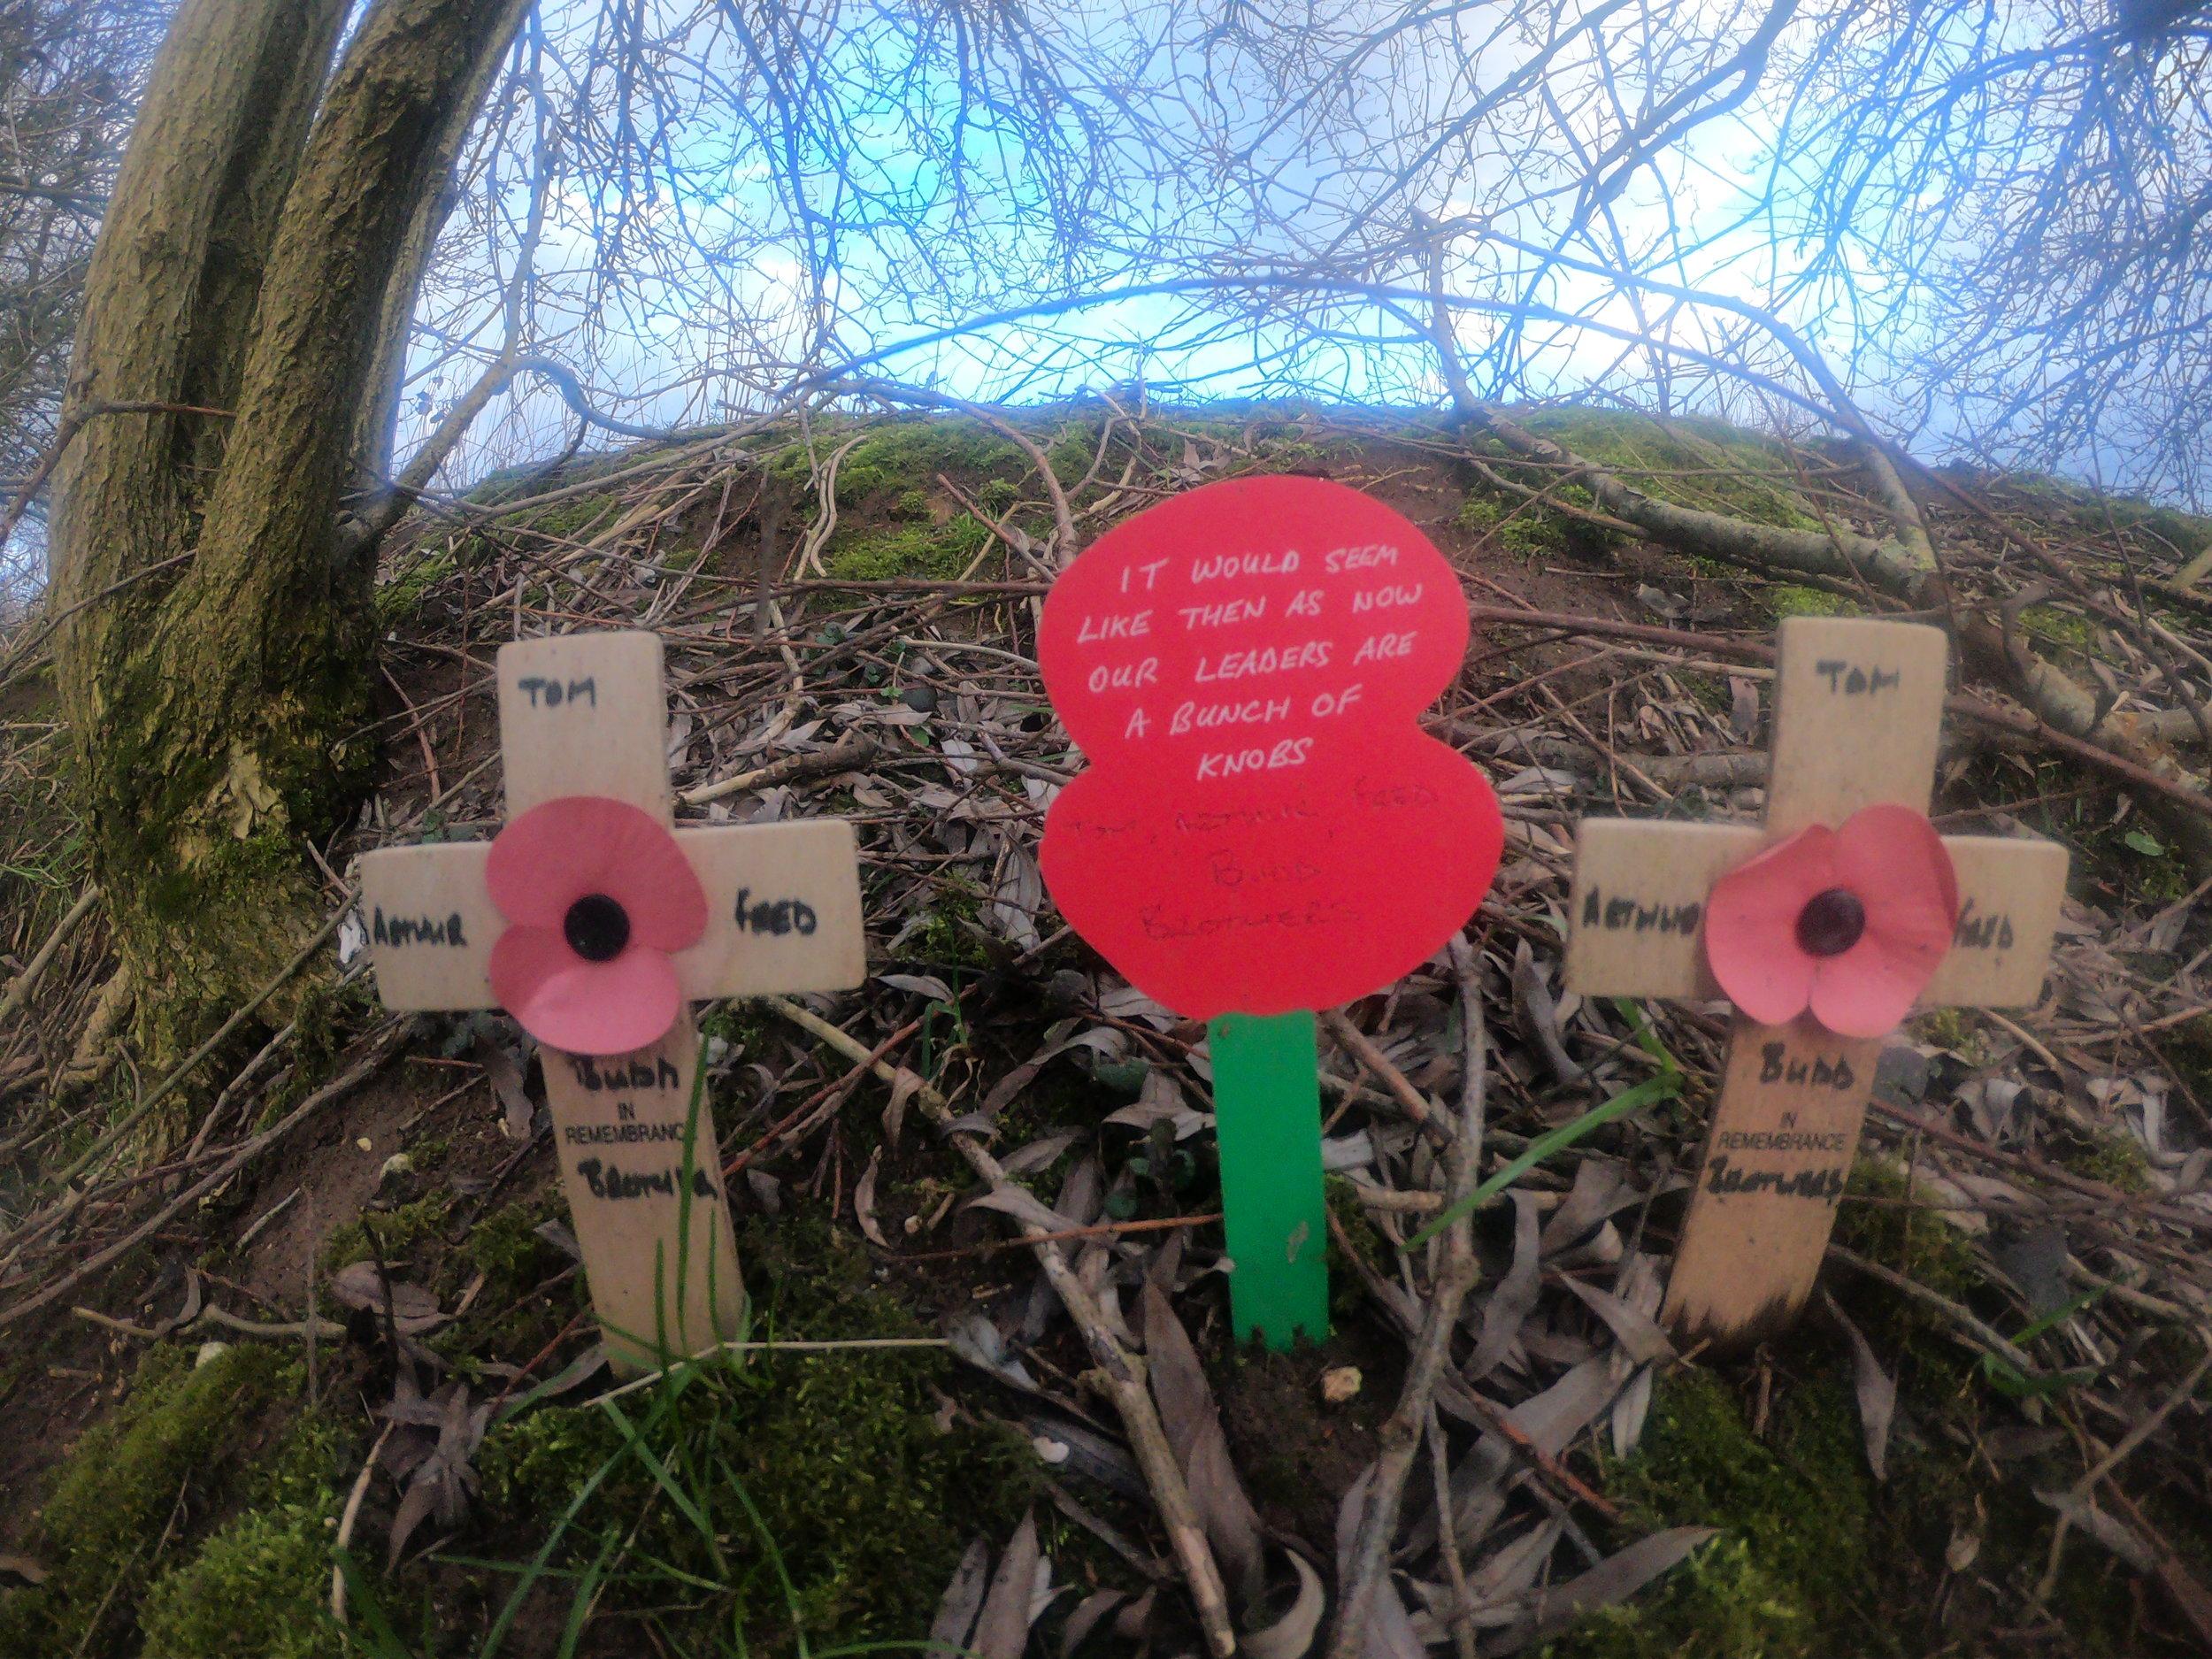 A message left at the 'Sunken Road' near Beaumont-Hamel.